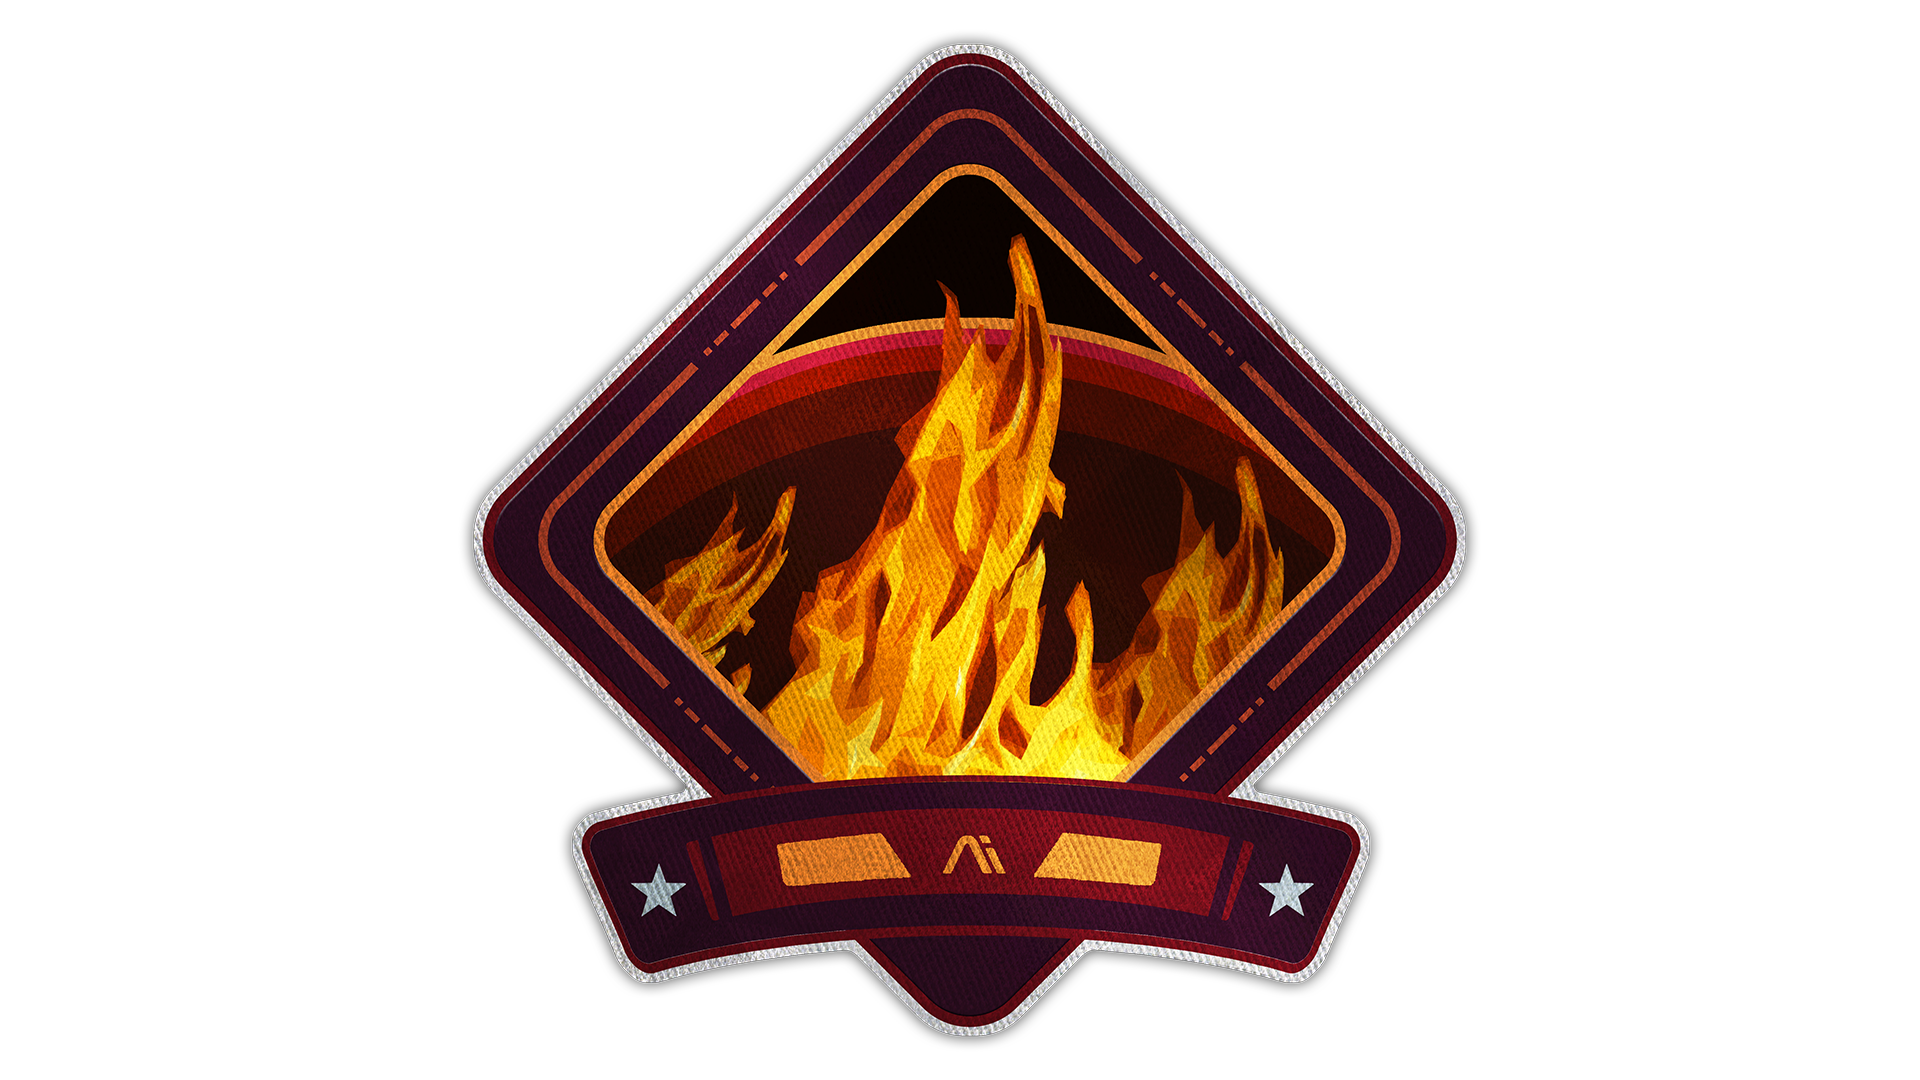 Pyrotechnics Expert